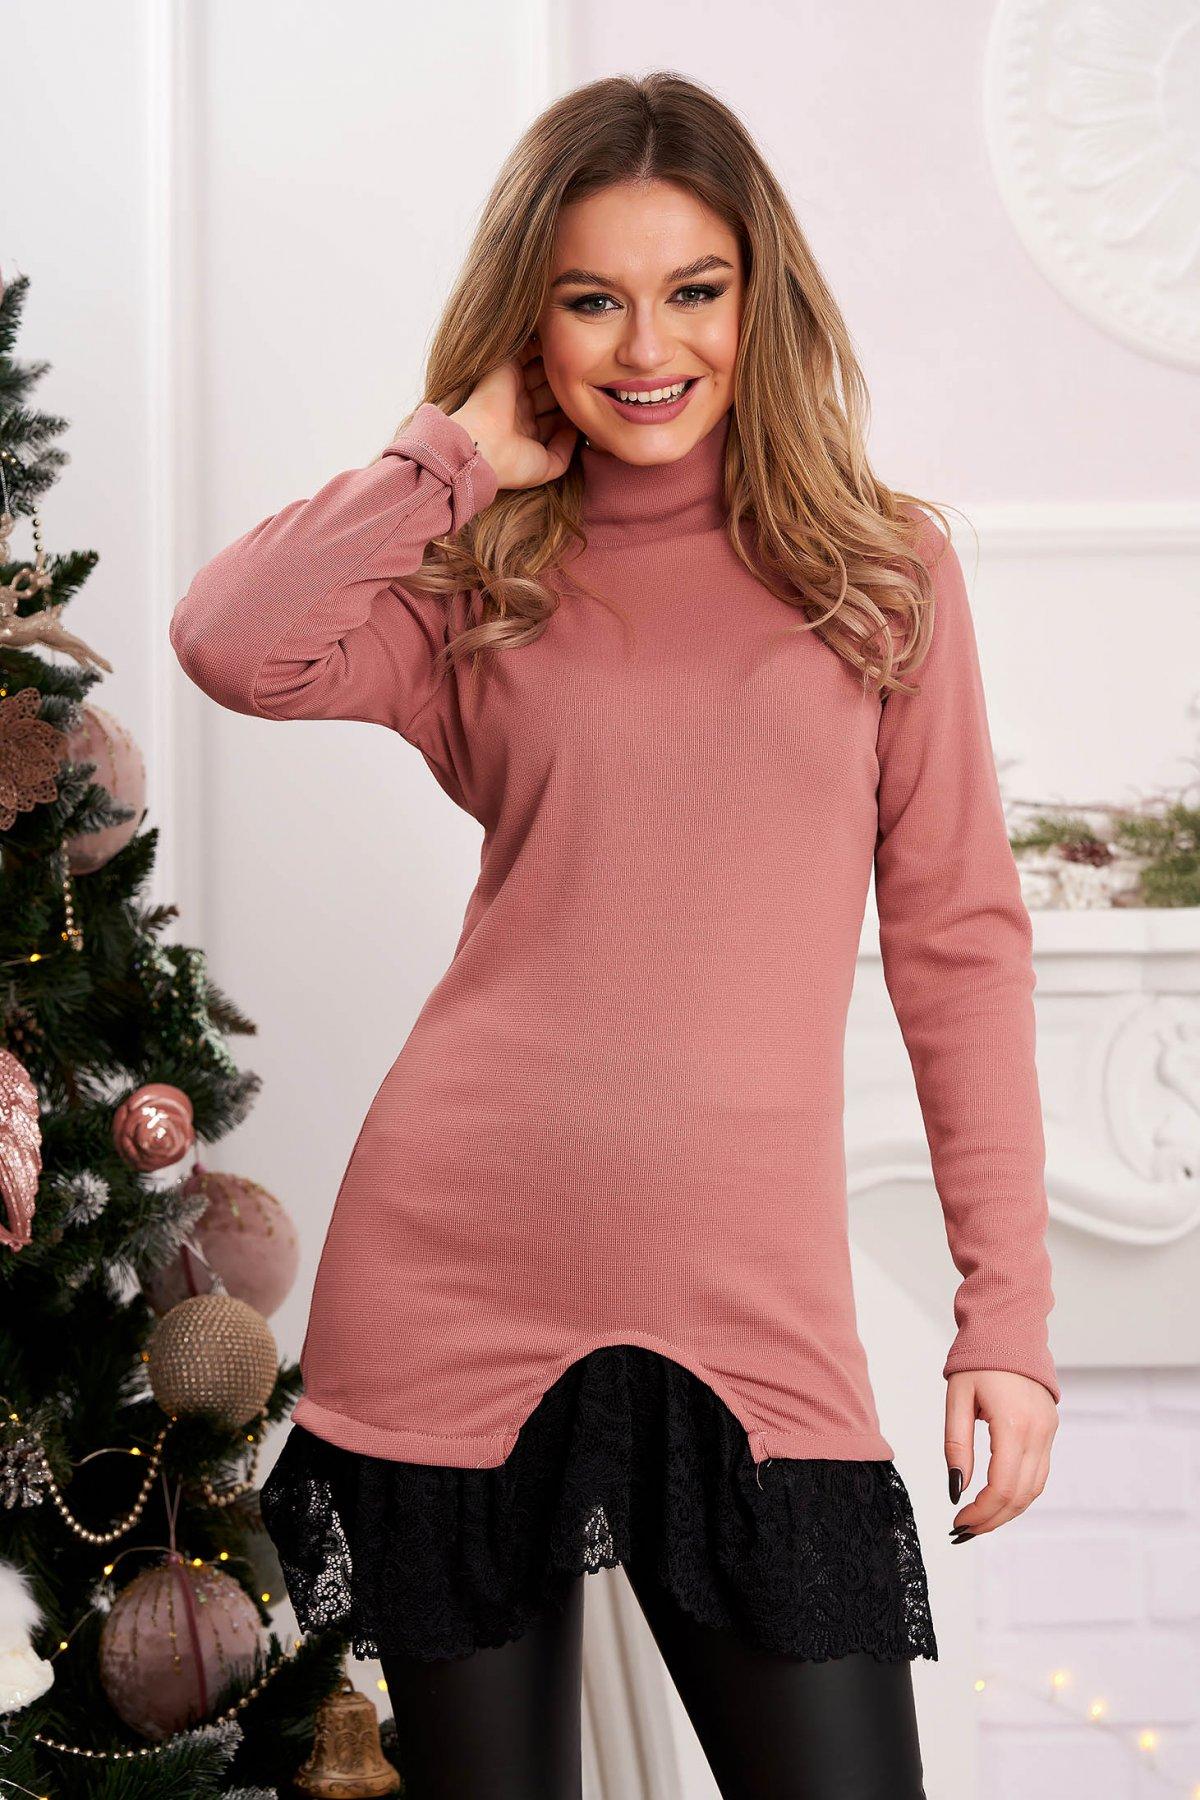 Bluza dama roz lunga tricotata pe gat cu aplicatii de dantela